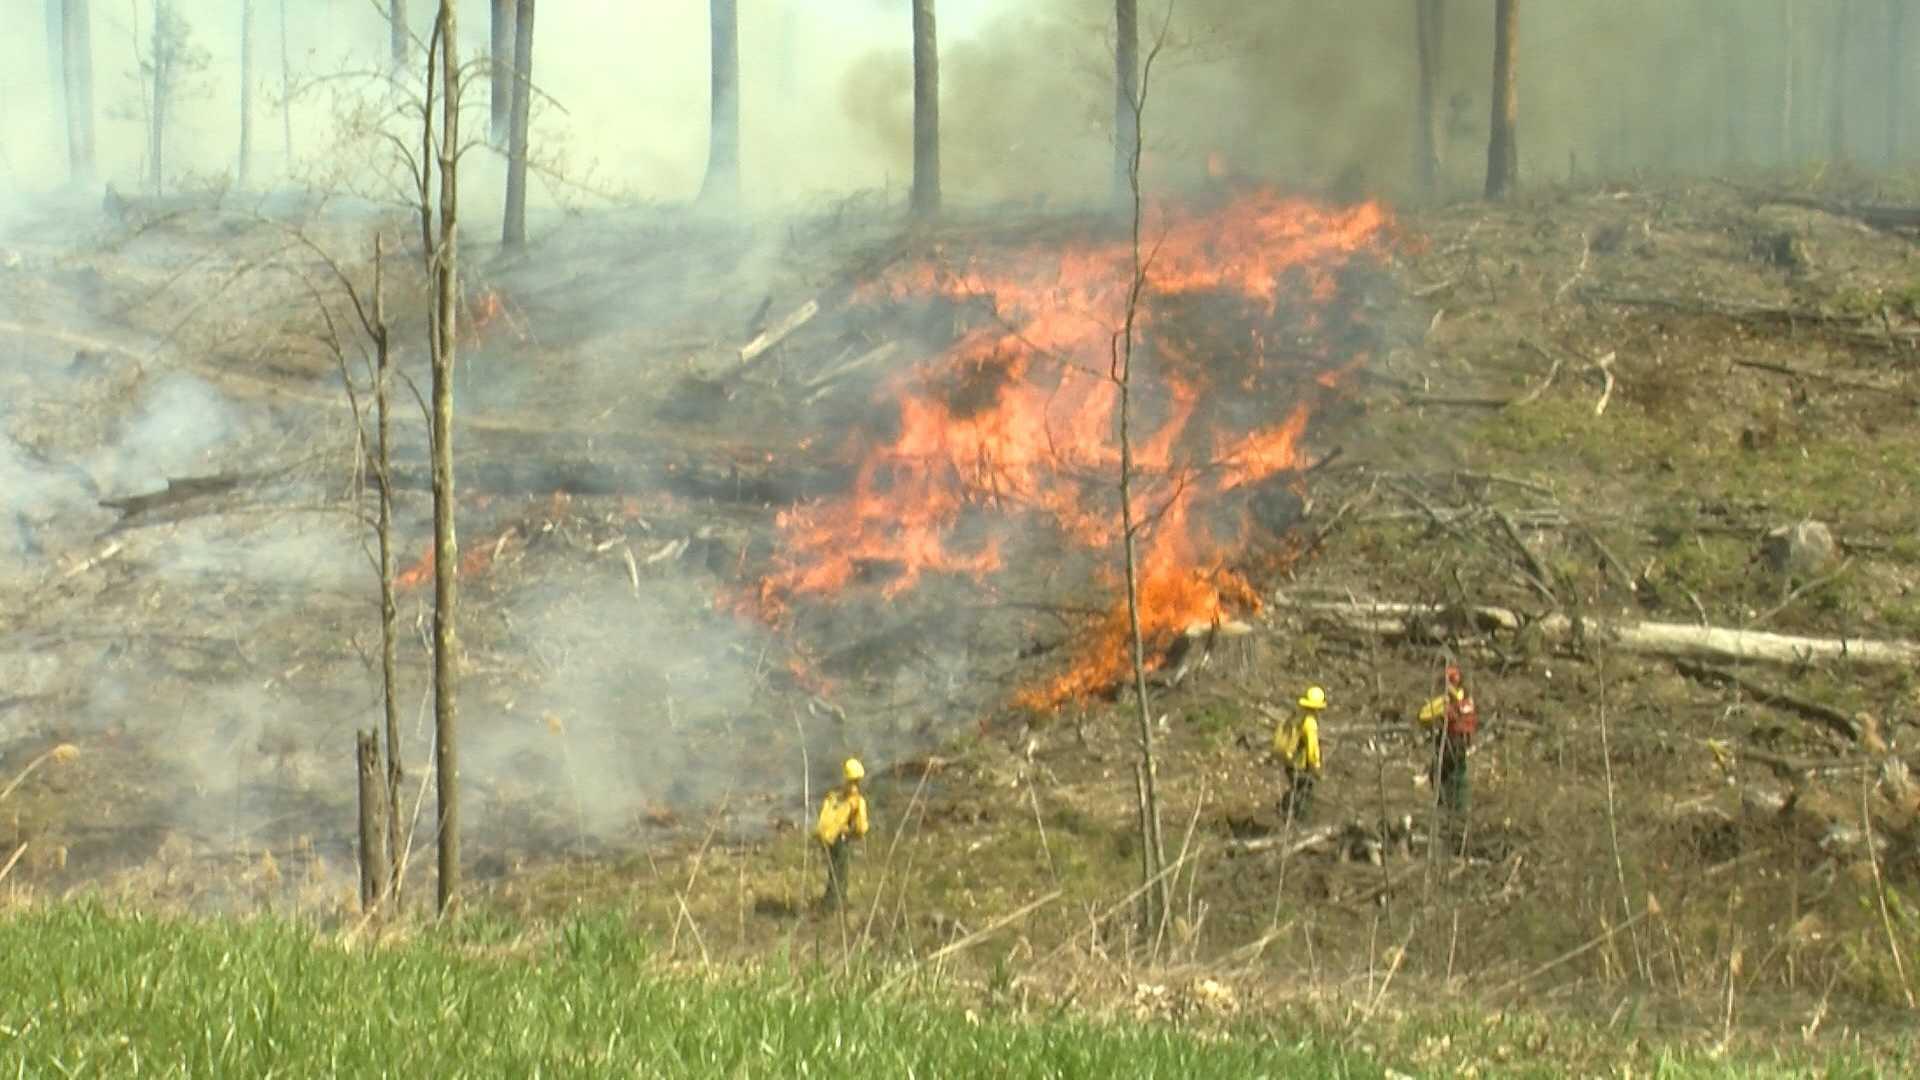 VTANG crews set fire to 15-acre plot